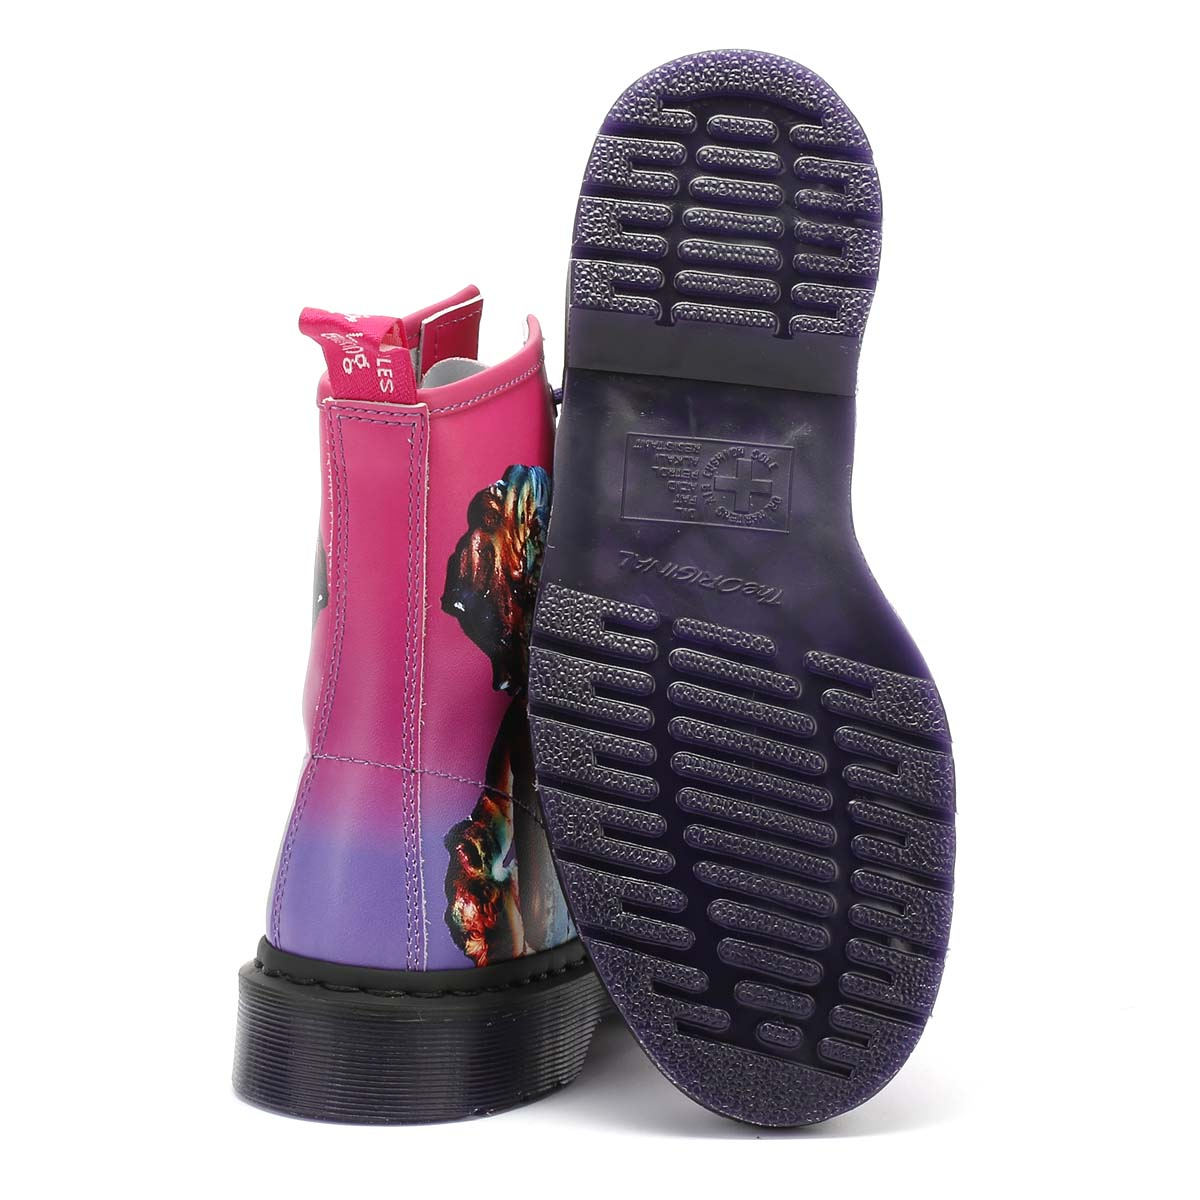 Dr. Martens Unisex Stiefel Stiefel Stiefel New Order Purple Backhand 1460 Technique Schuhes dcbbe2